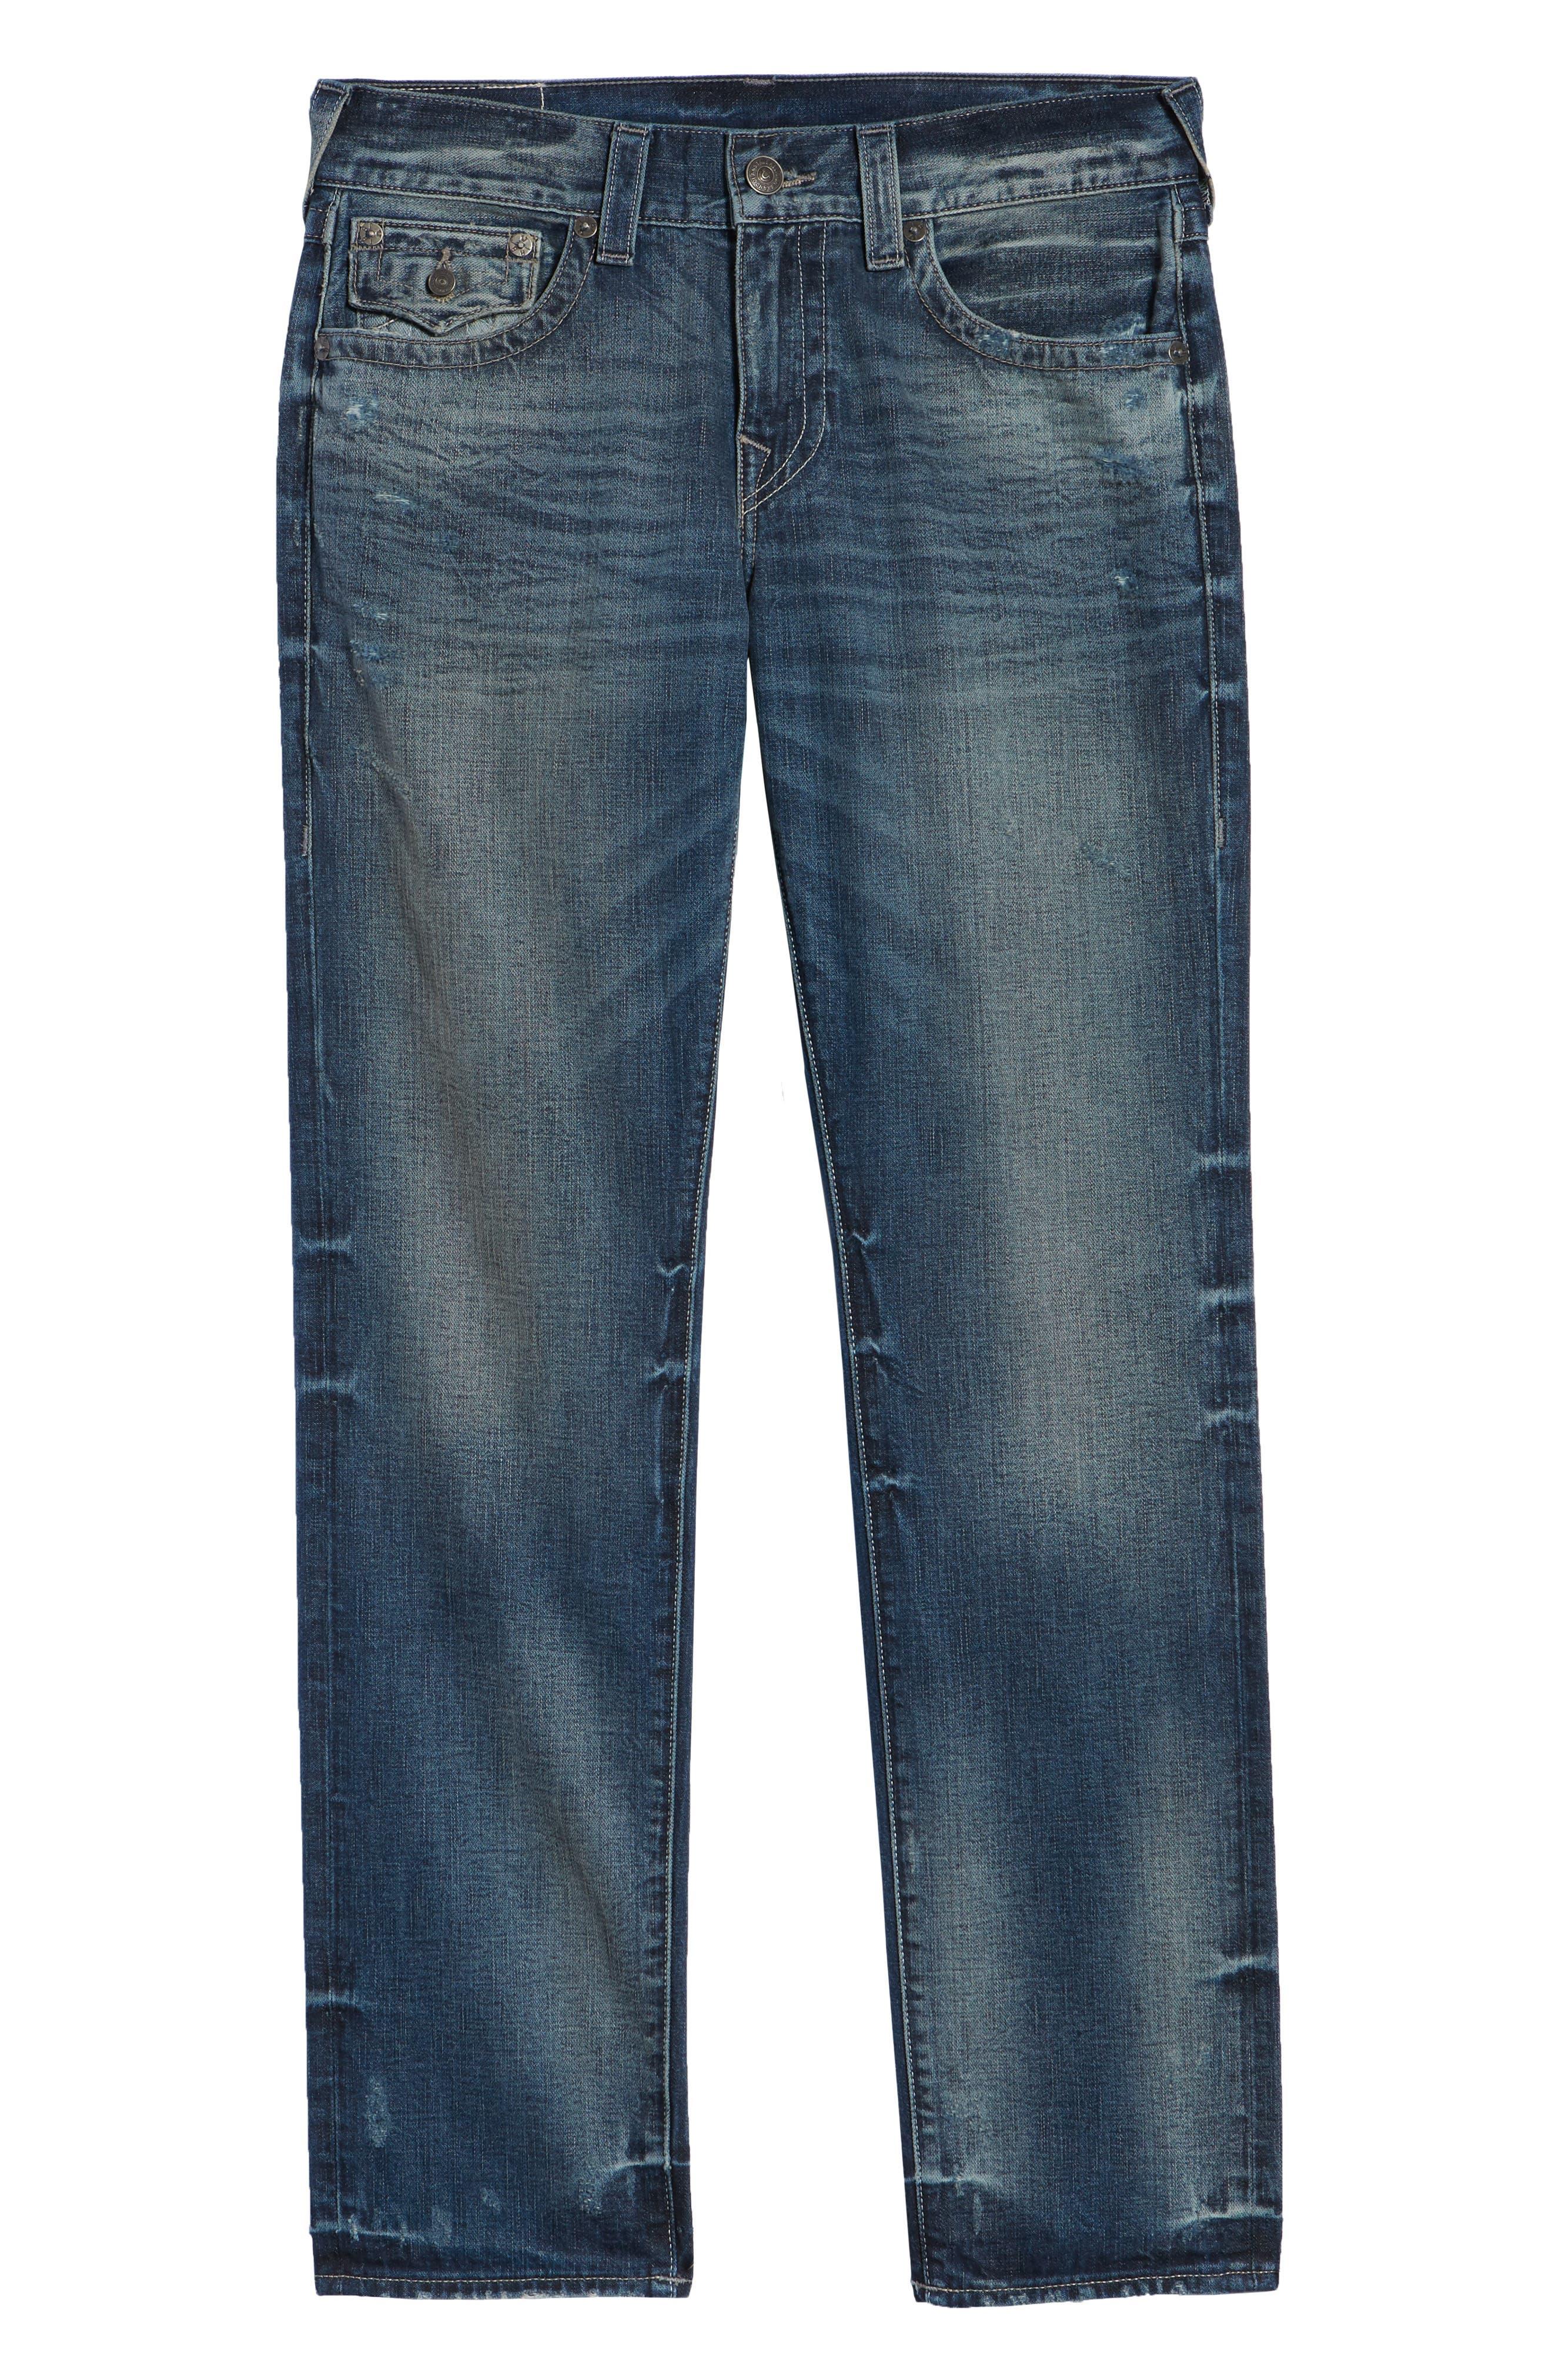 Geno Straight Leg Jeans,                             Alternate thumbnail 6, color,                             COMBAT BLUE